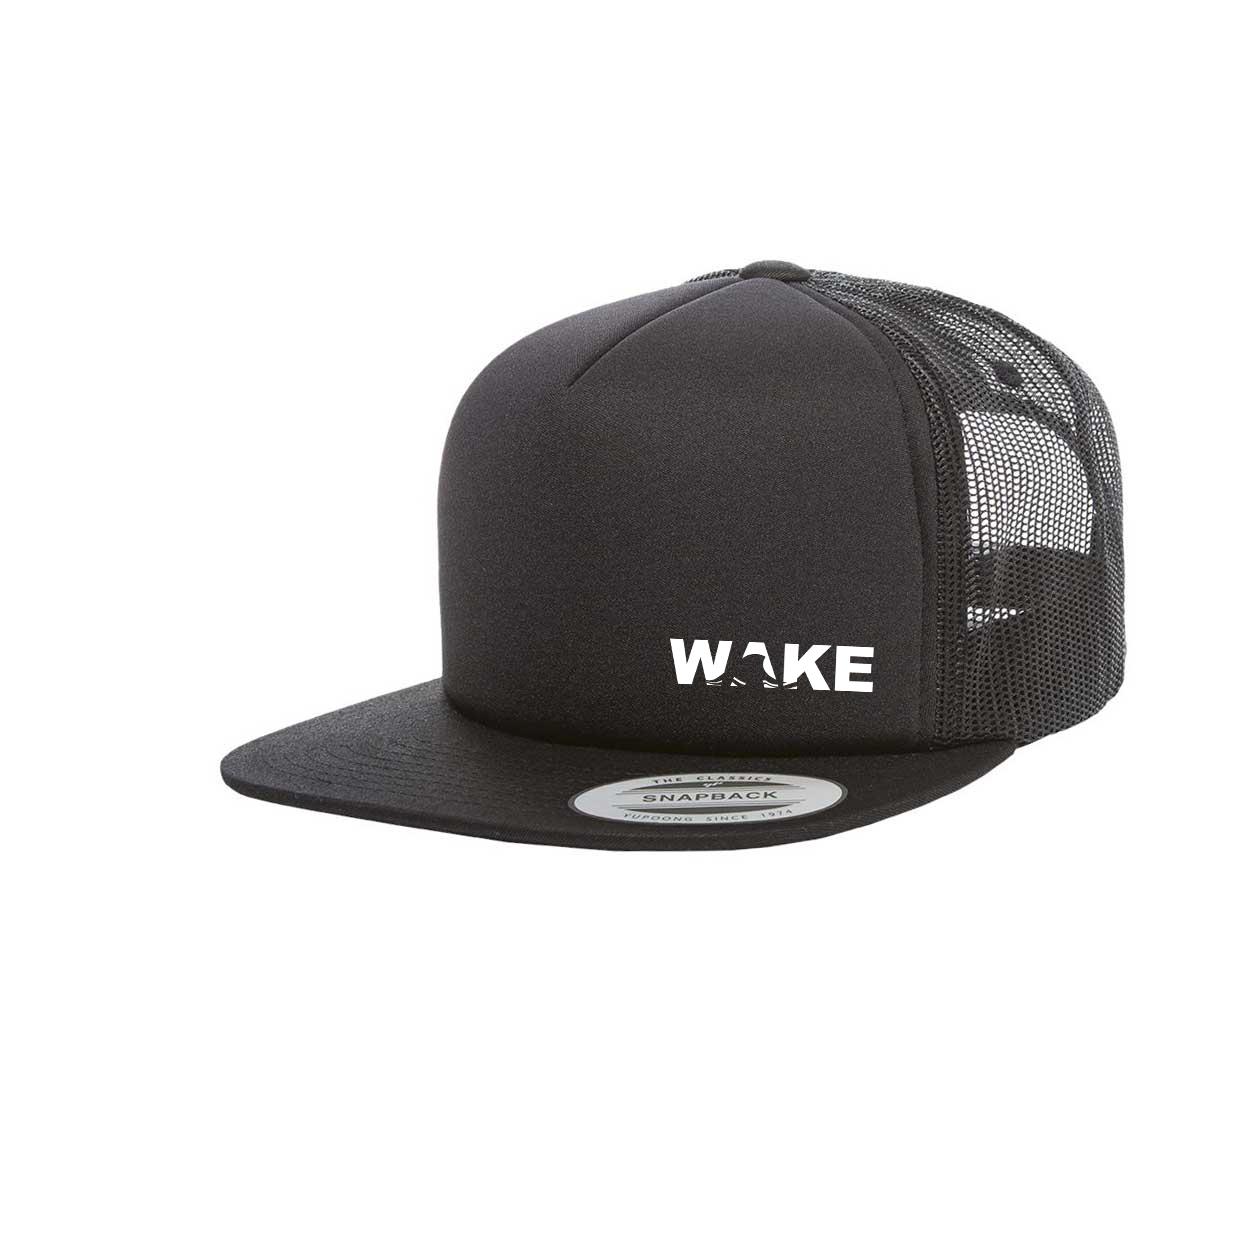 Wake Wave Logo Night Out Premium Foam Flat Brim Snapback Hat Black (White Logo)